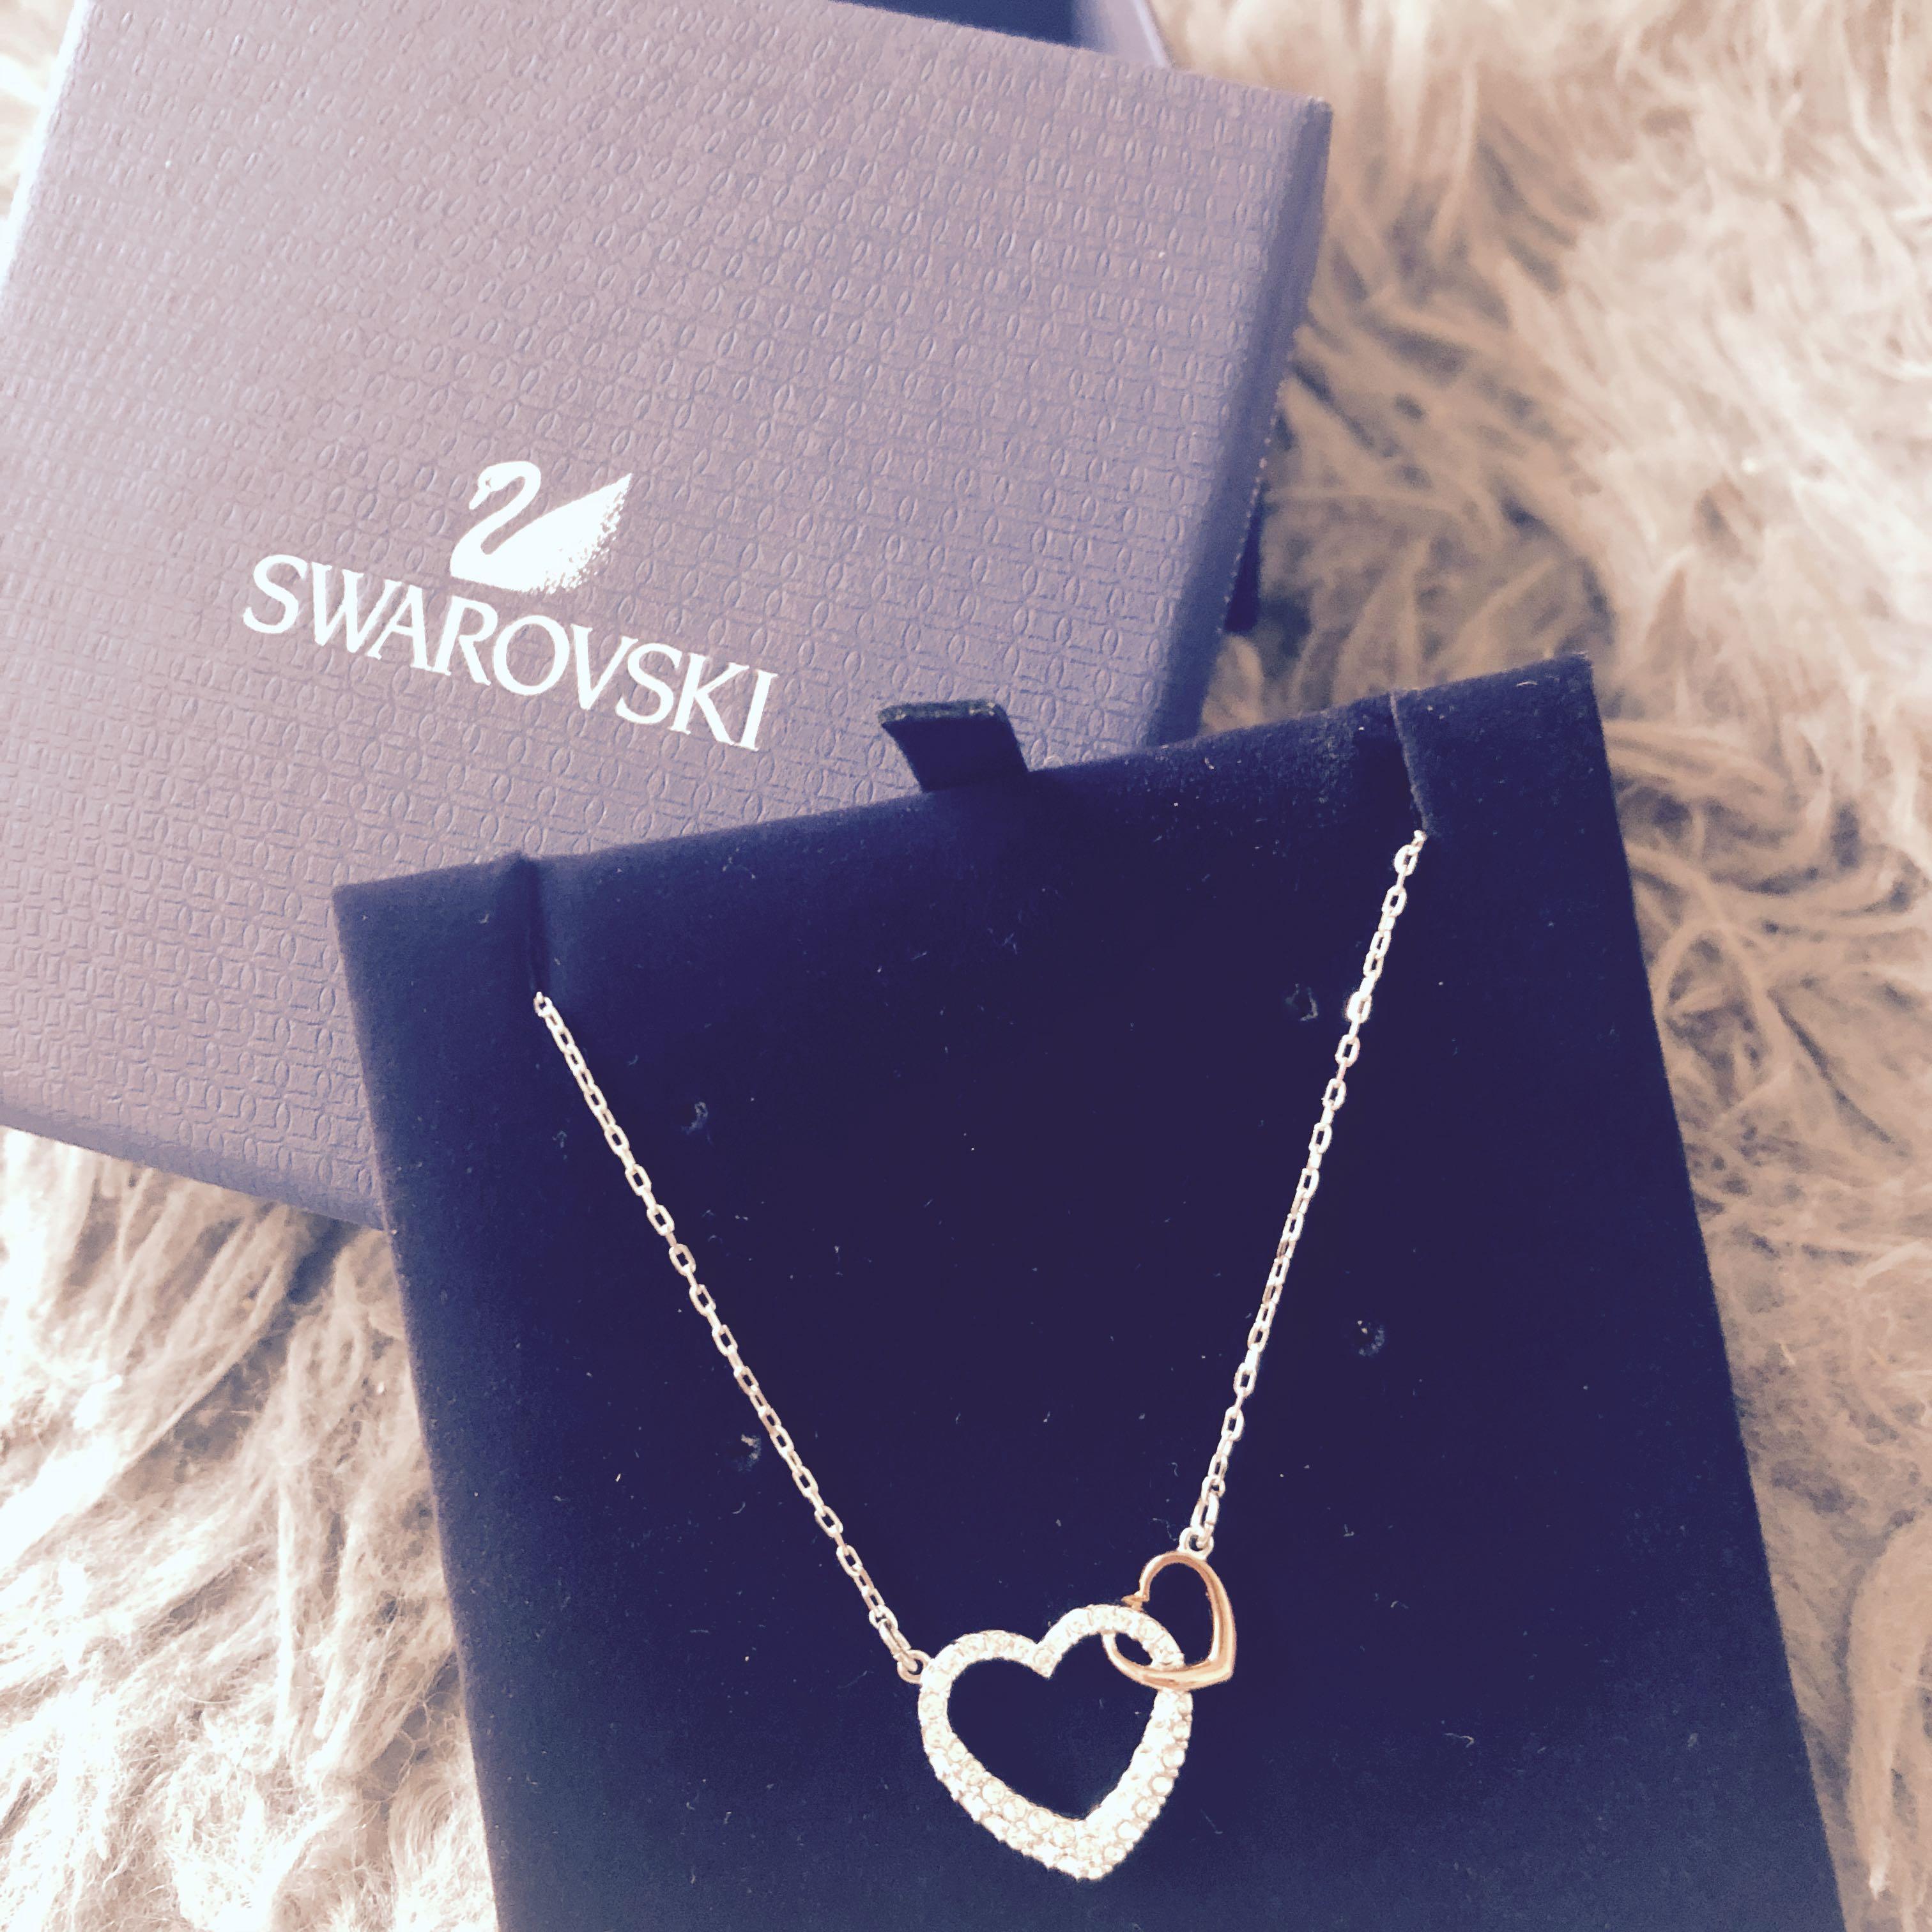 8b23f6922d0b2 Swarovski DEAR Necklace Small, Women's Fashion, Jewellery, Necklaces ...